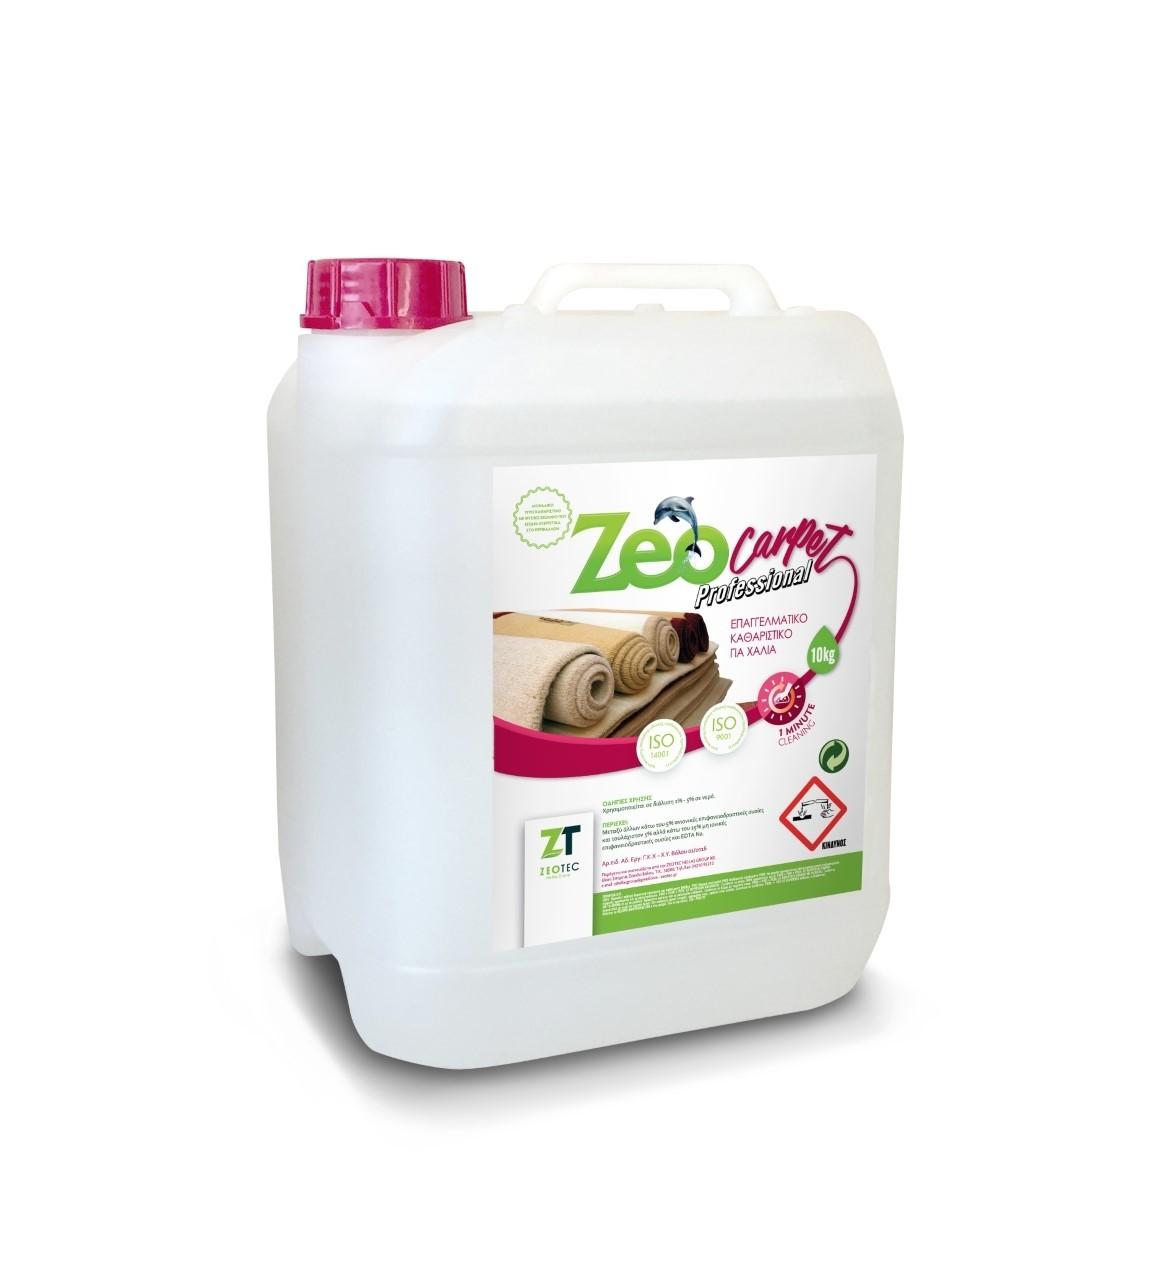 Zeo Carpet Professional - Εξειδικευμένο υγρό απορρυπαντικό για χαλιά και μοκέτες 20lt